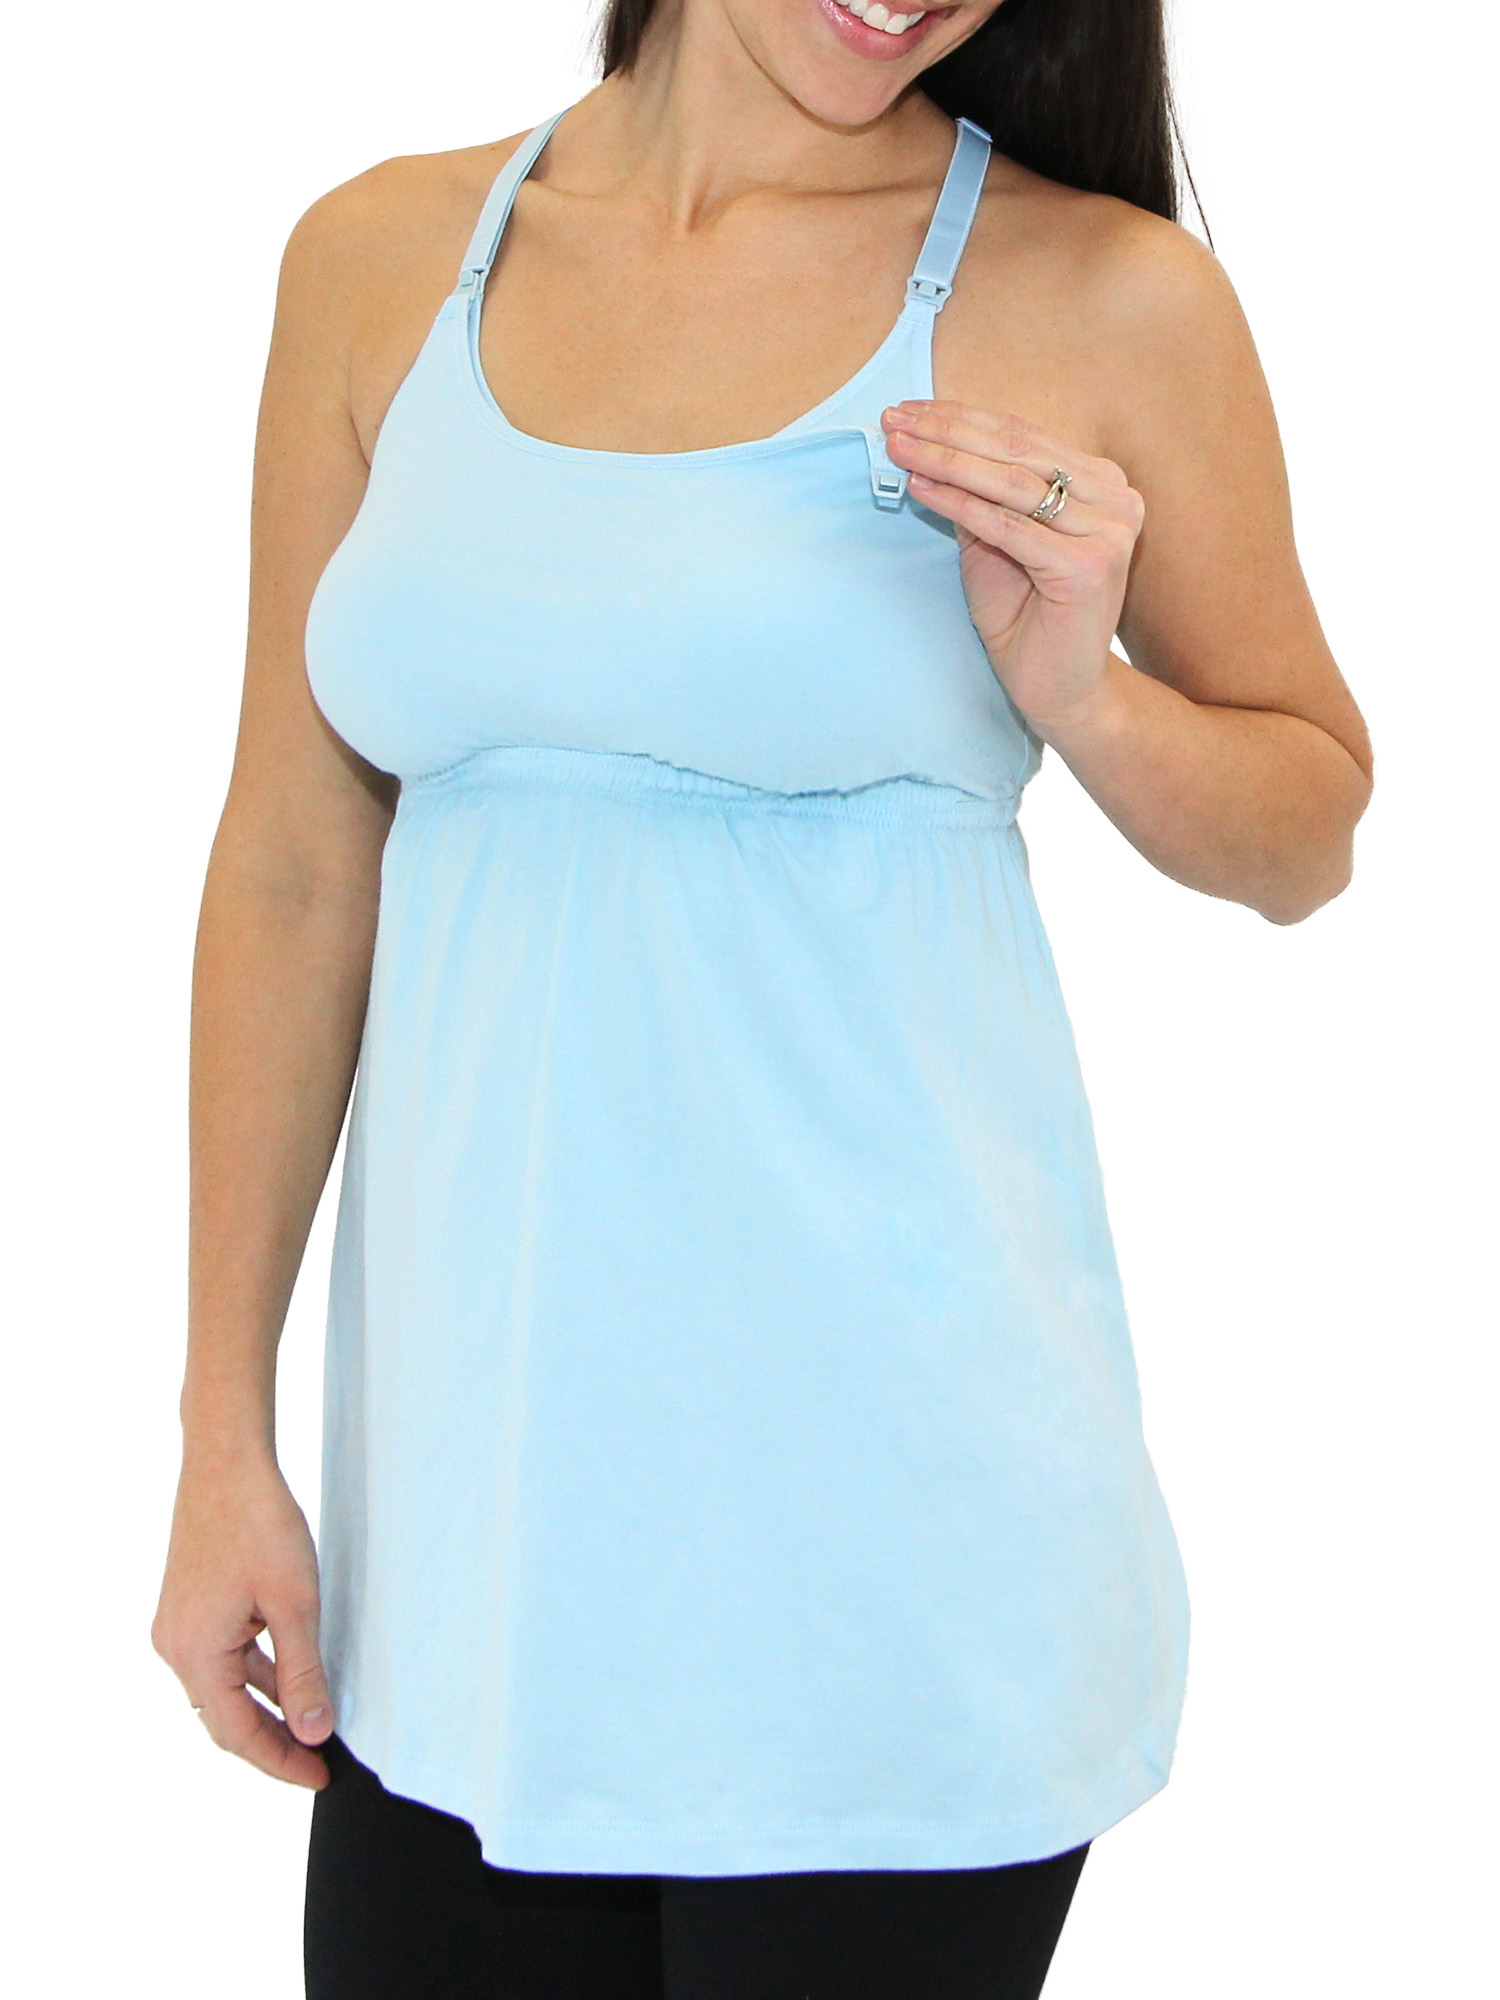 Empire Waist Nursing Cami, Style 4049